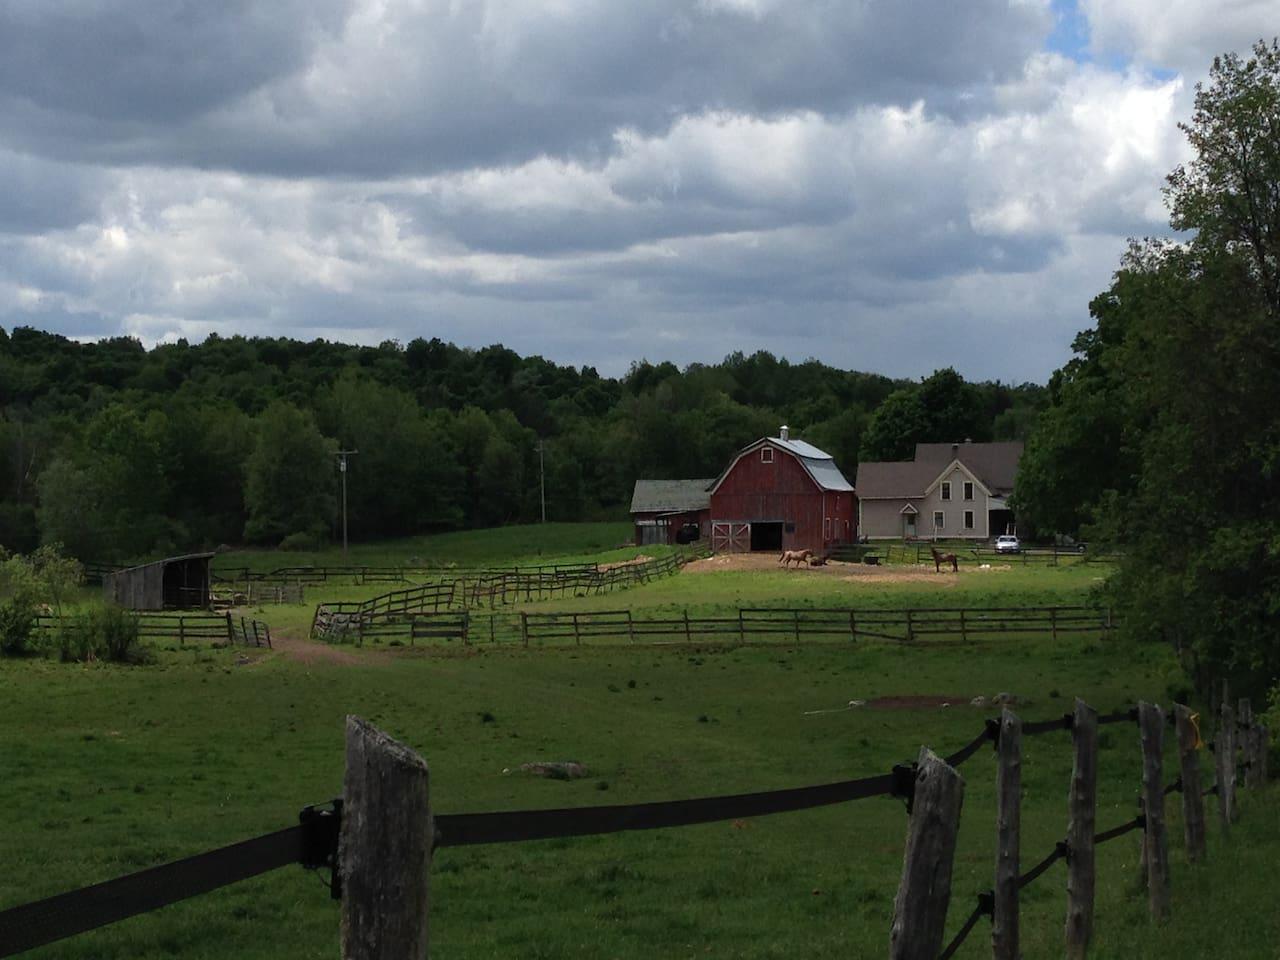 Summer at The Farm